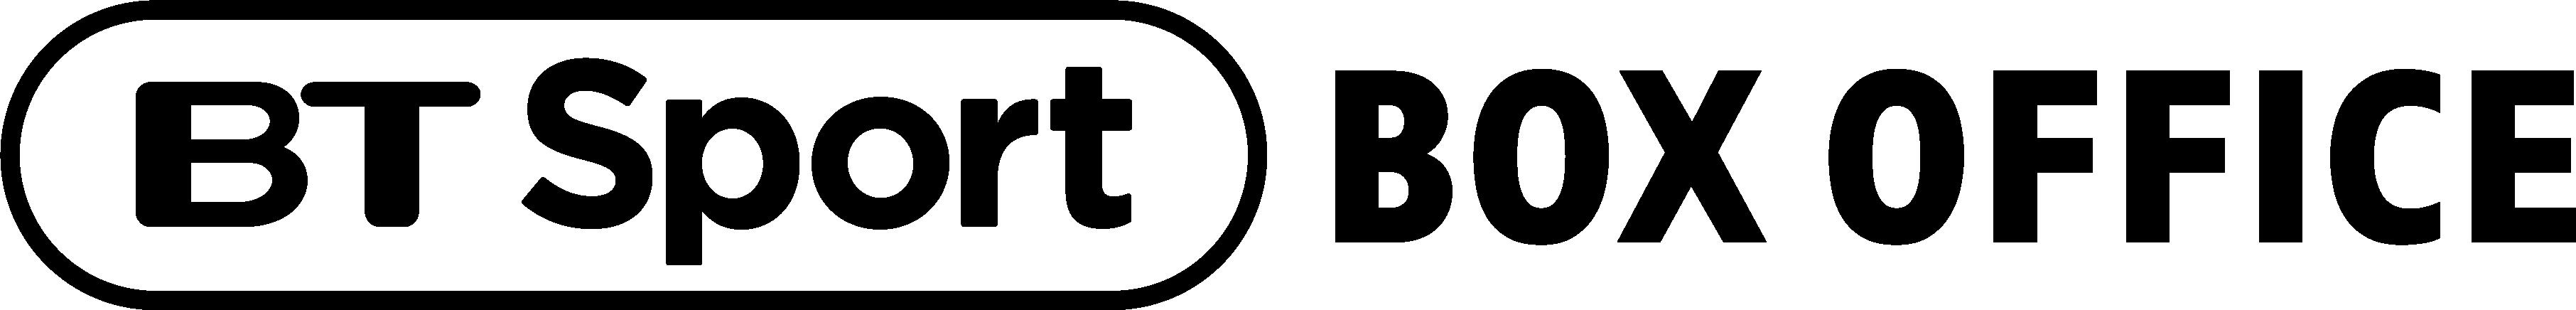 BT-BoxOffice-black.png